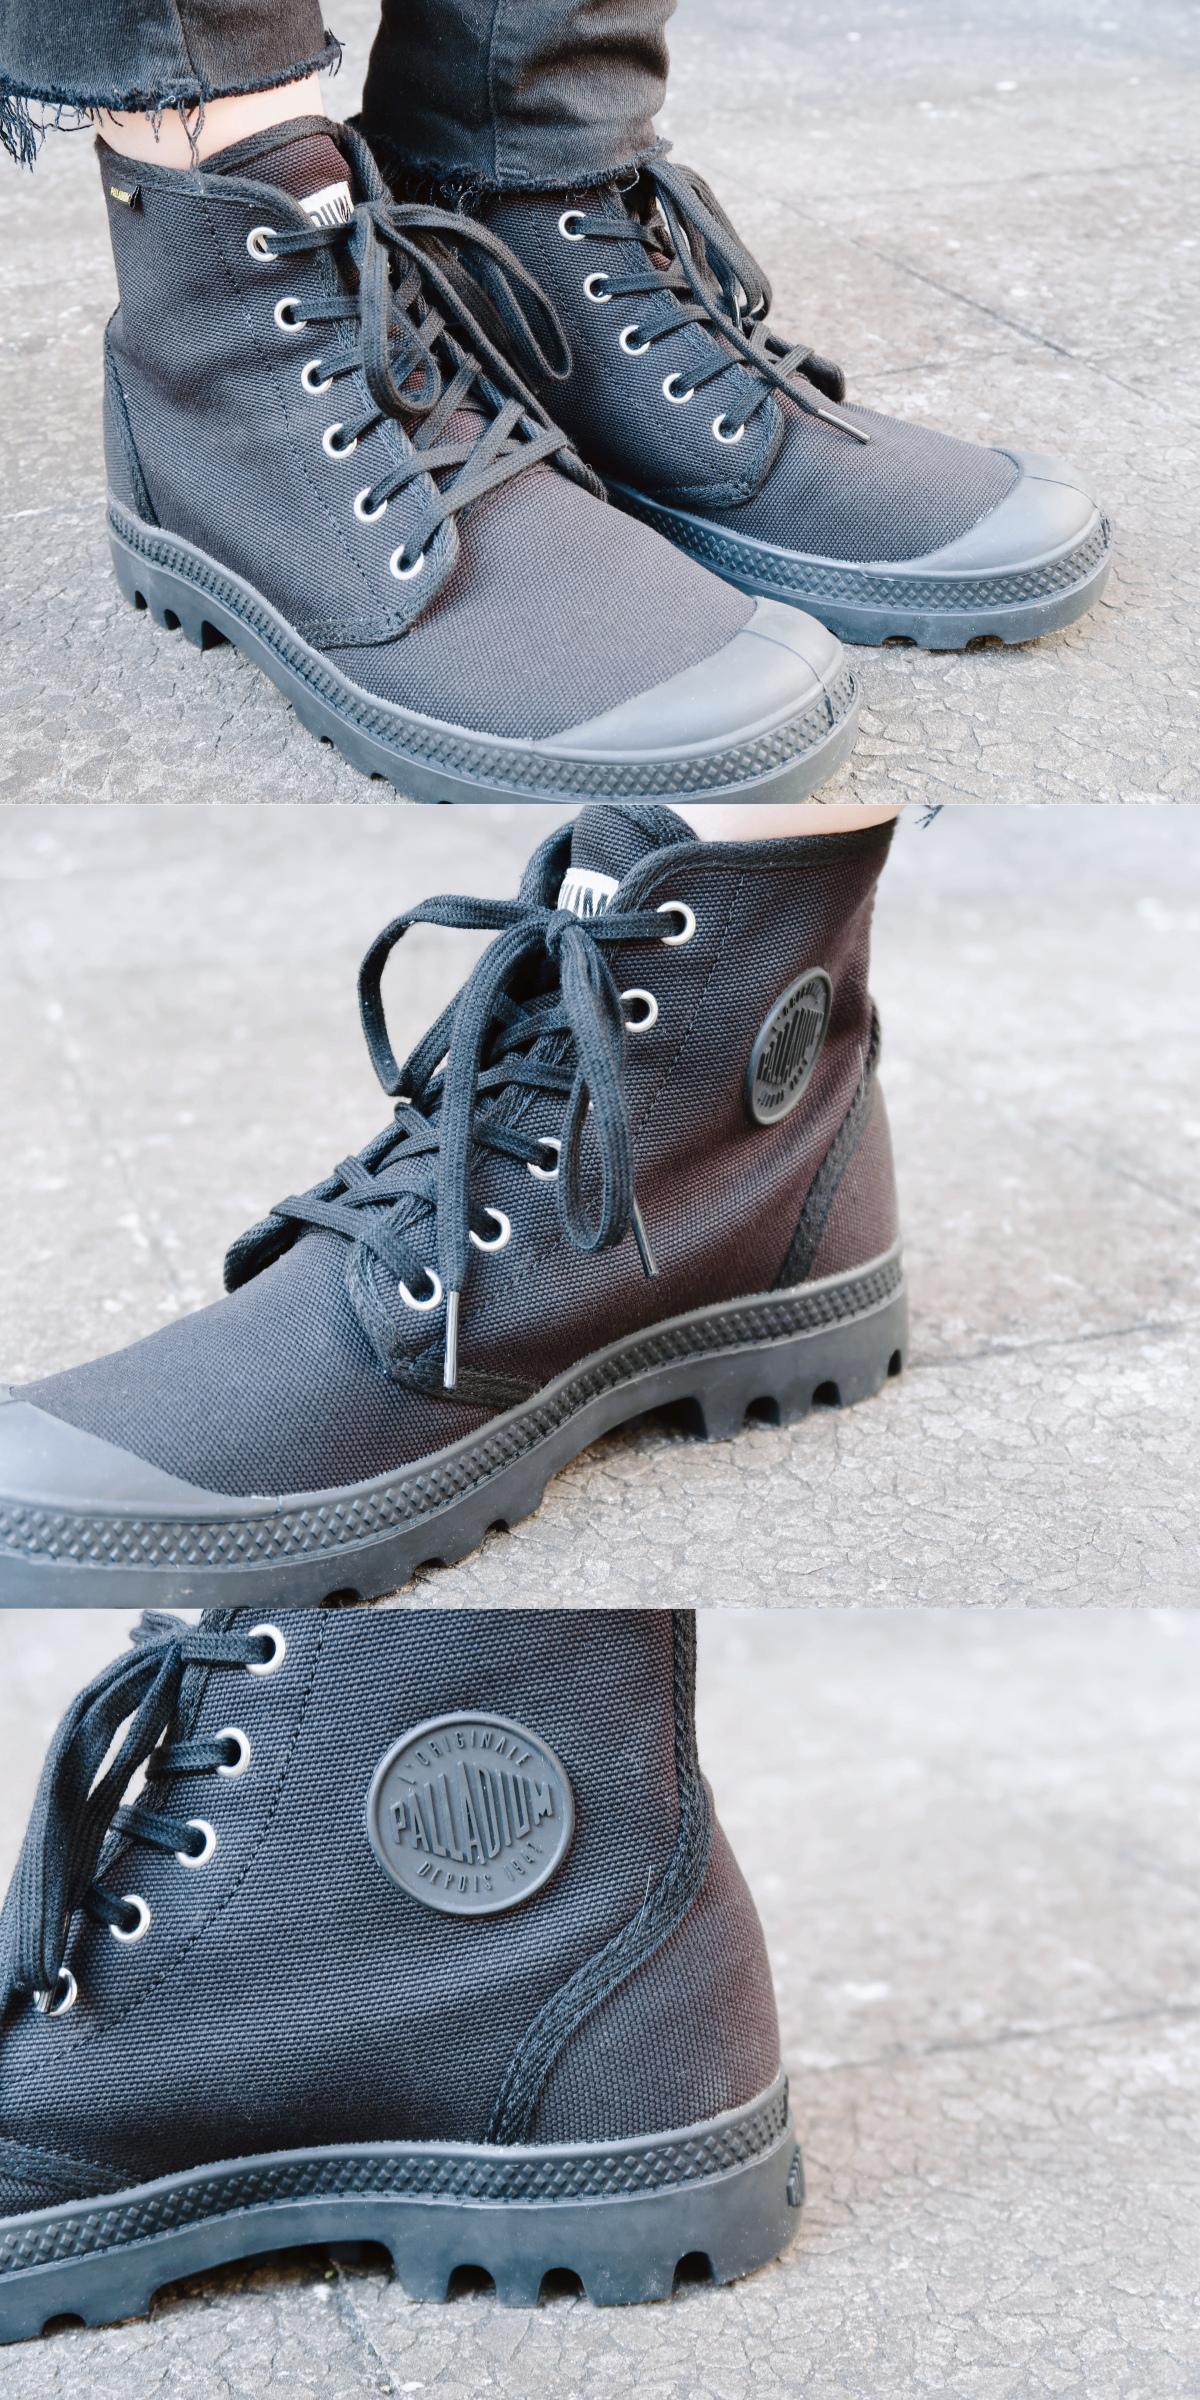 IMG_6_Palladium Boots.jpg